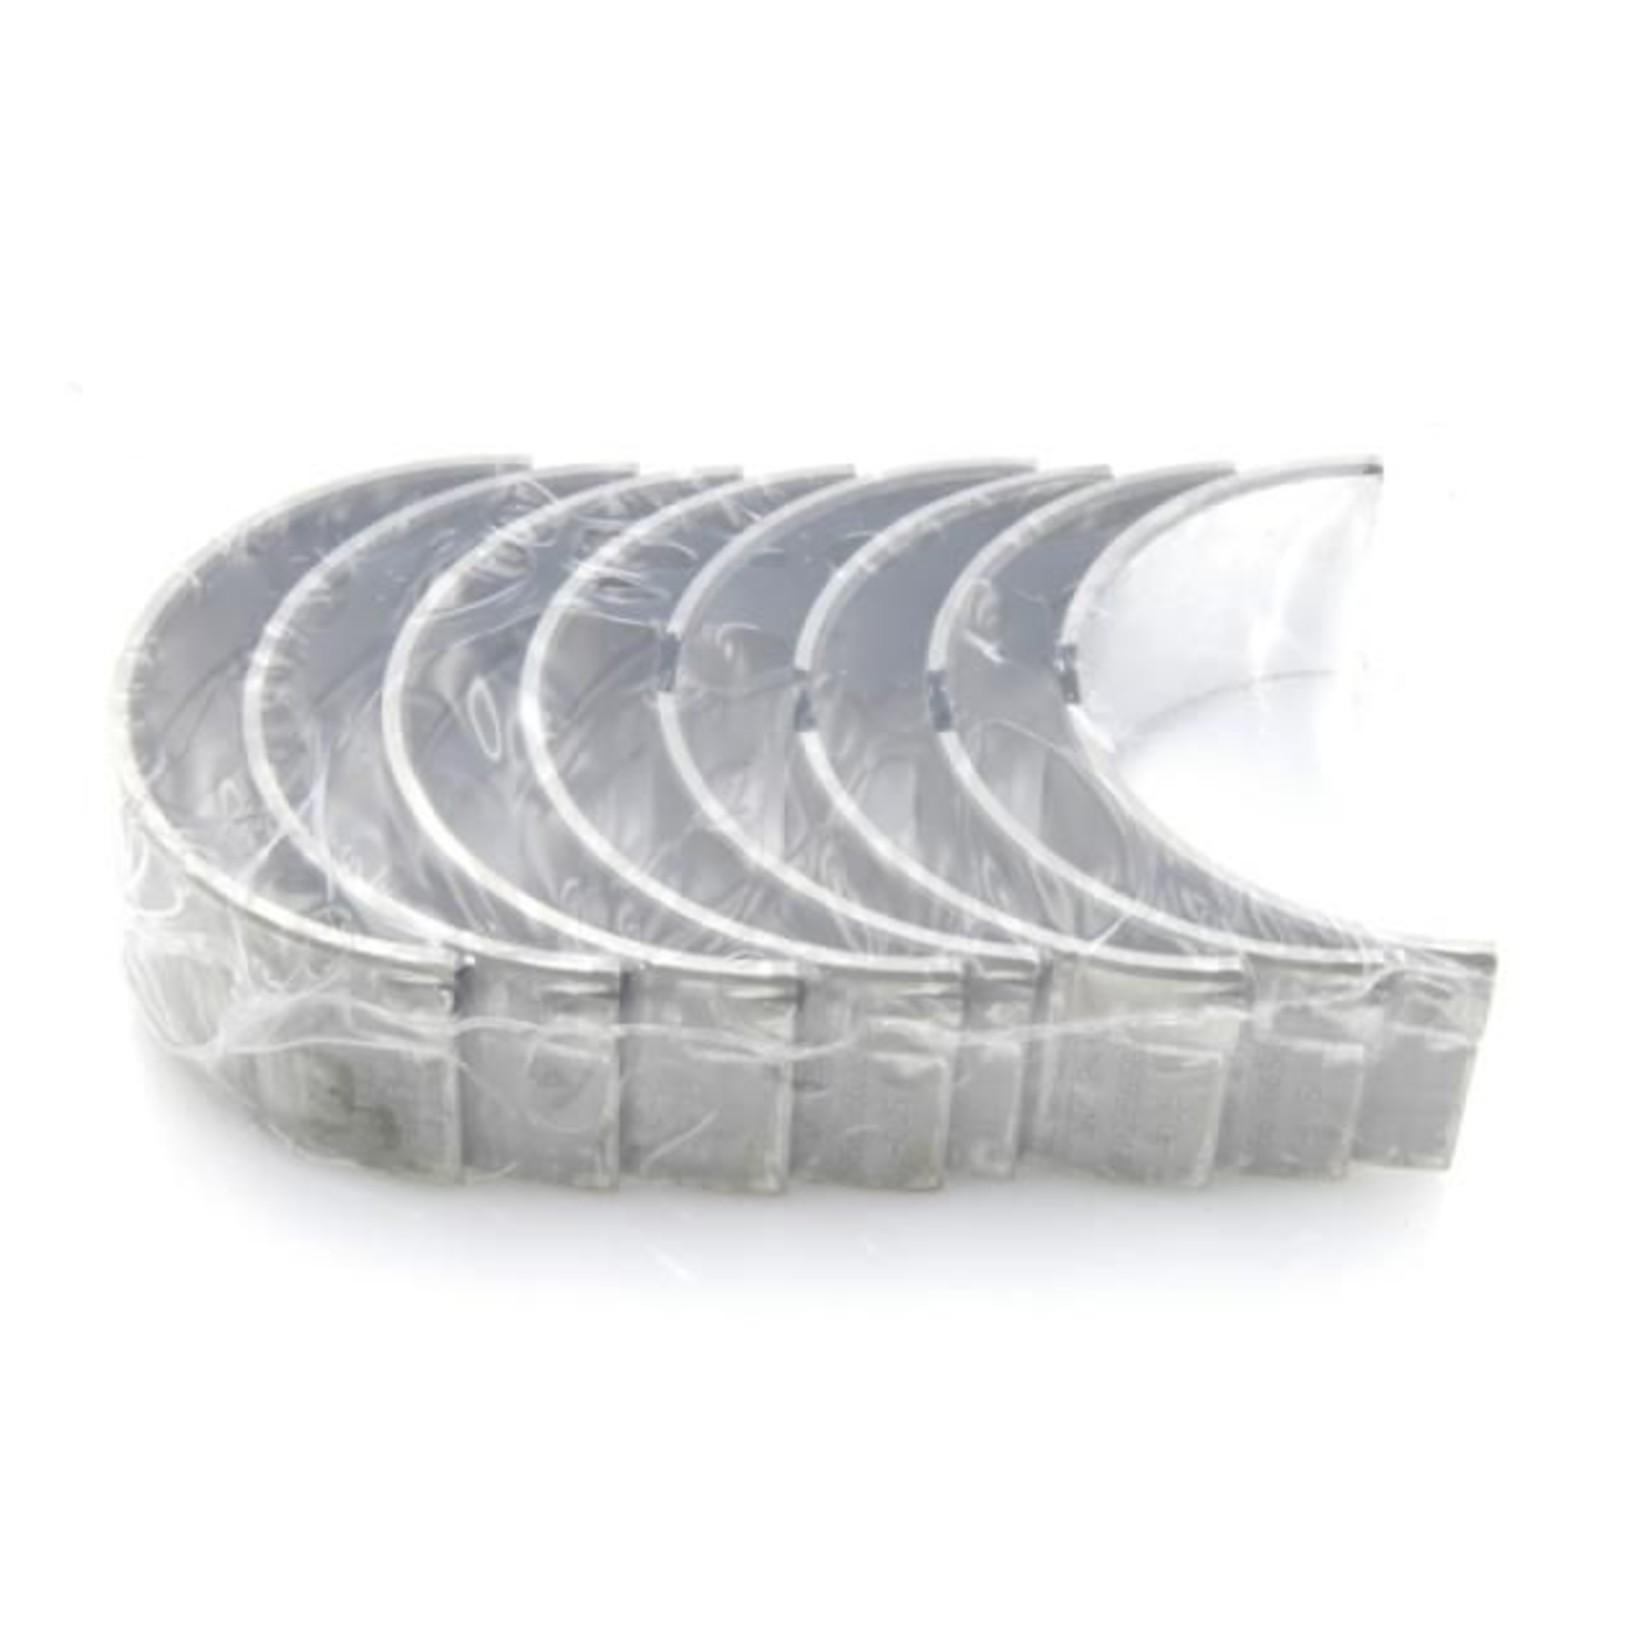 Casquillo cabeza biela 66- Standard 5 paliers Nr Org: DX121019D